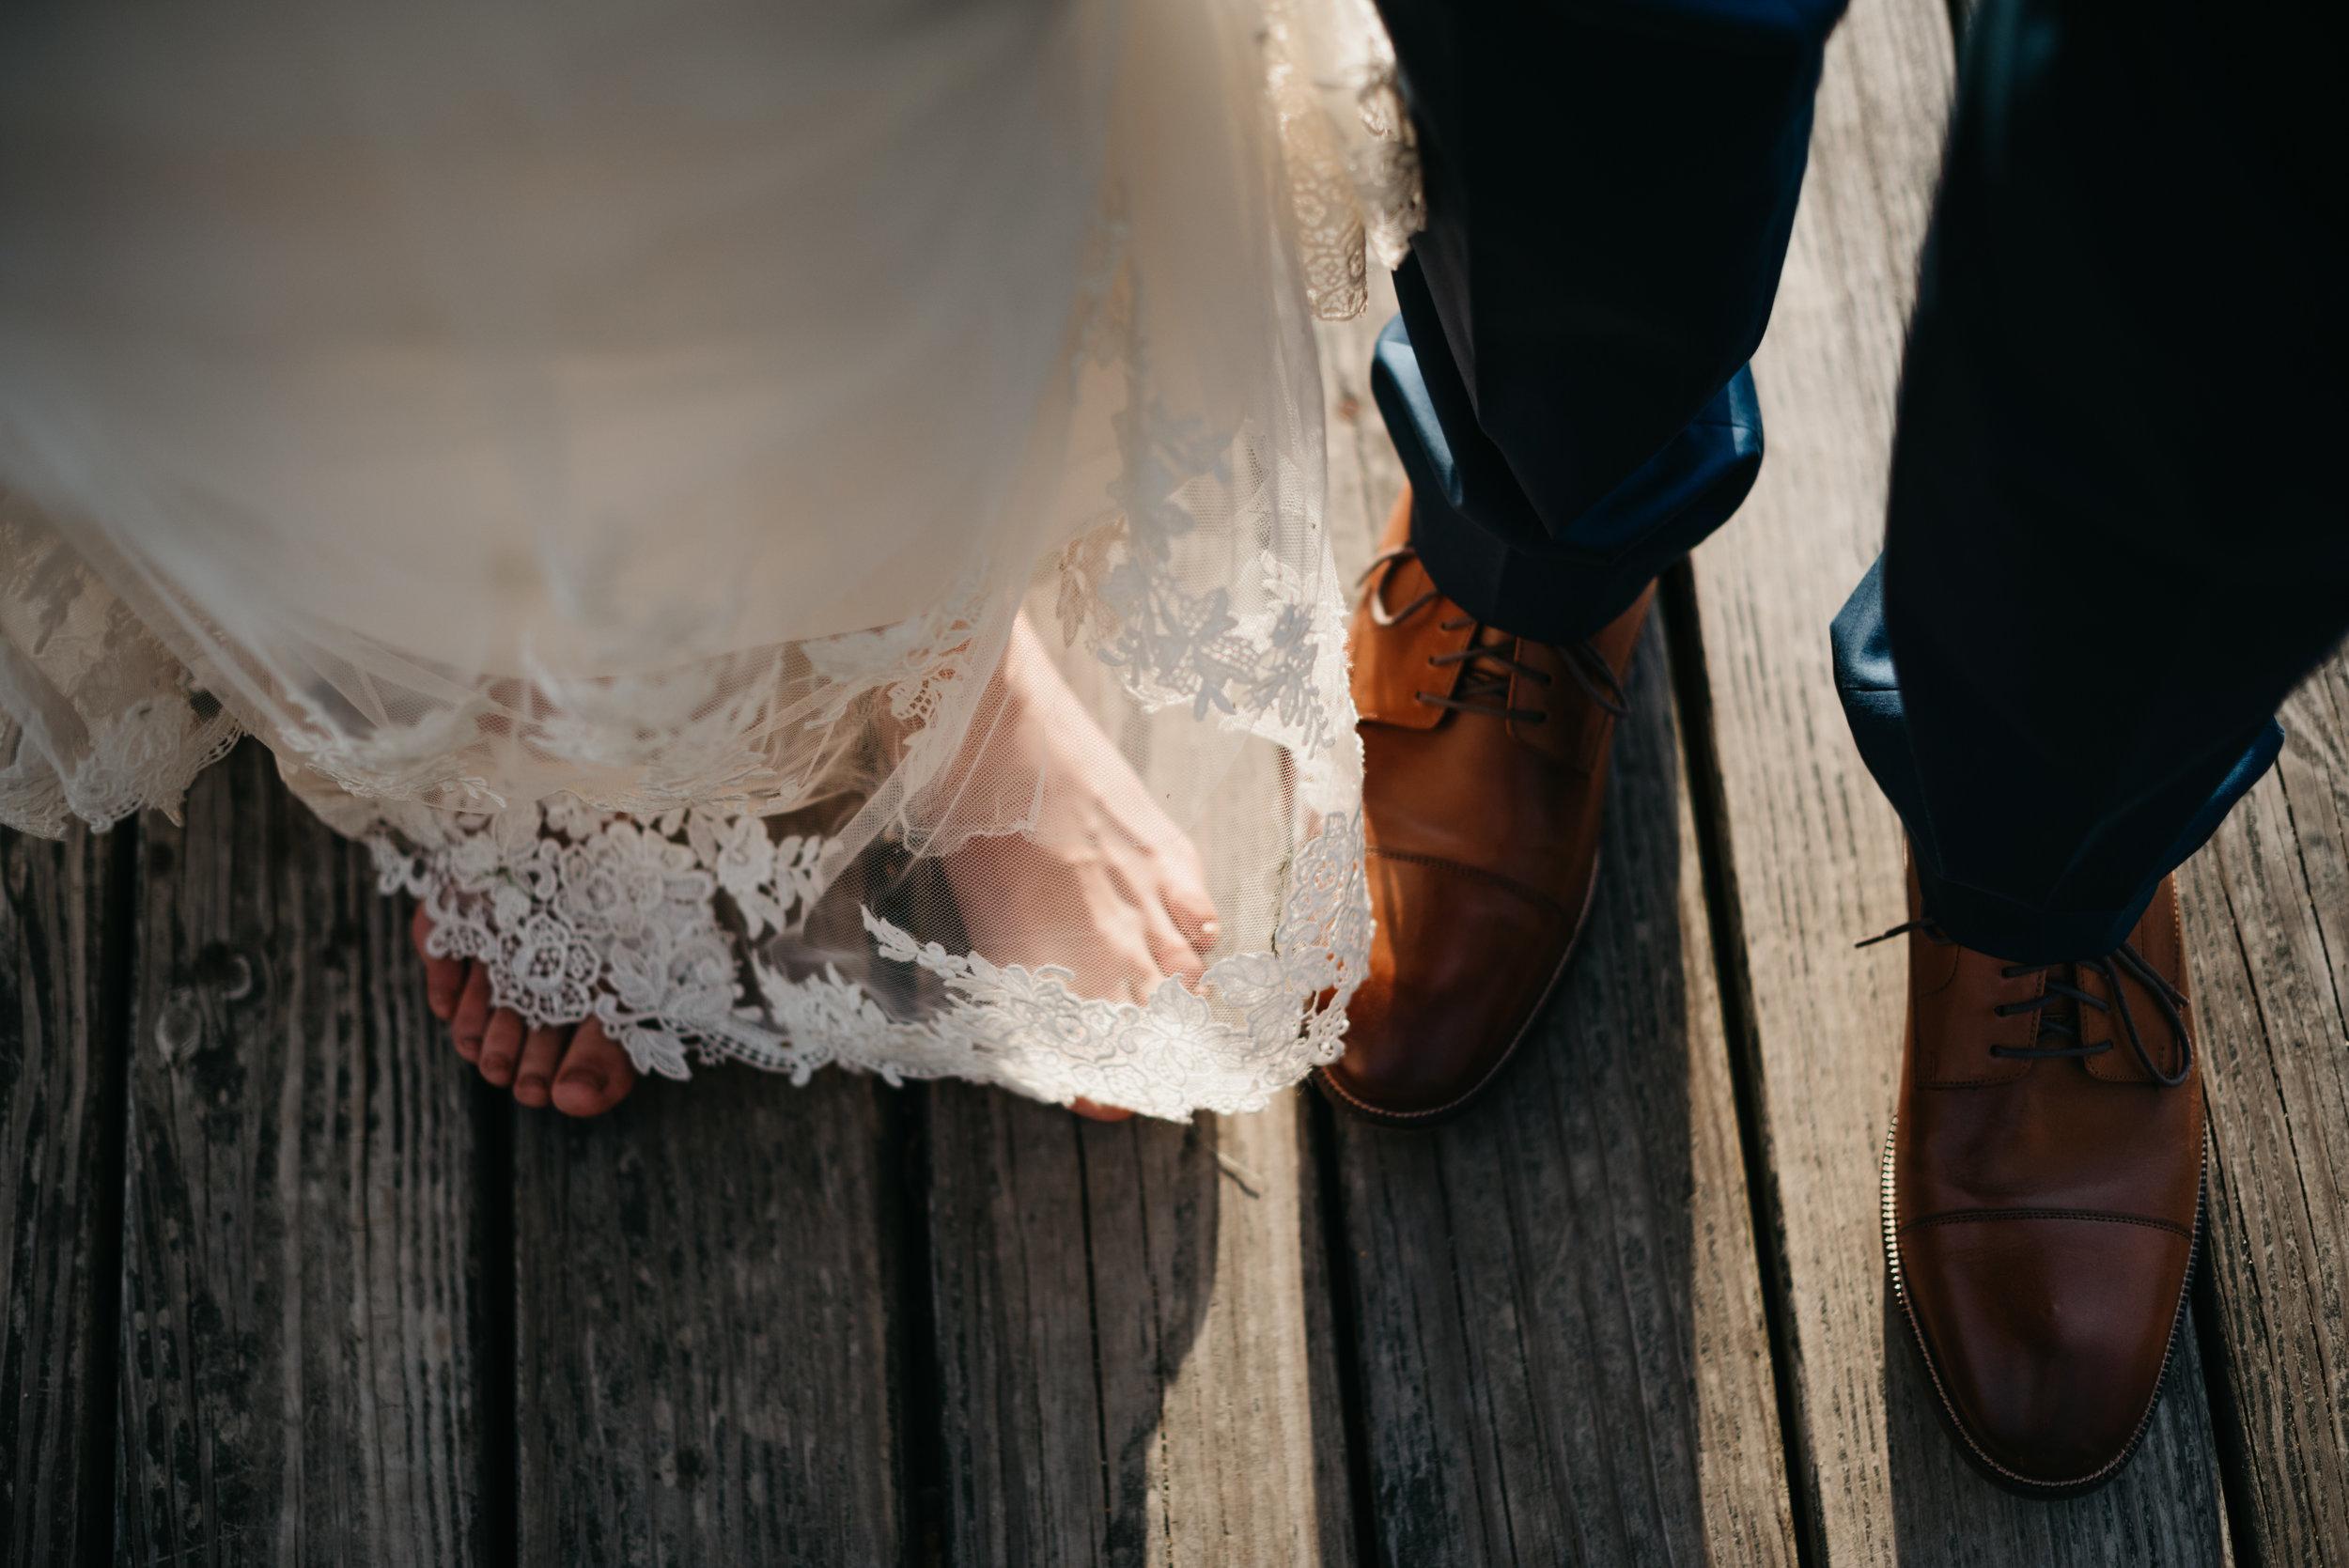 Barch-Massachusetts-Lakeside Tent Wedding-Western Massachusetts Wedding Photographer-03100.jpg